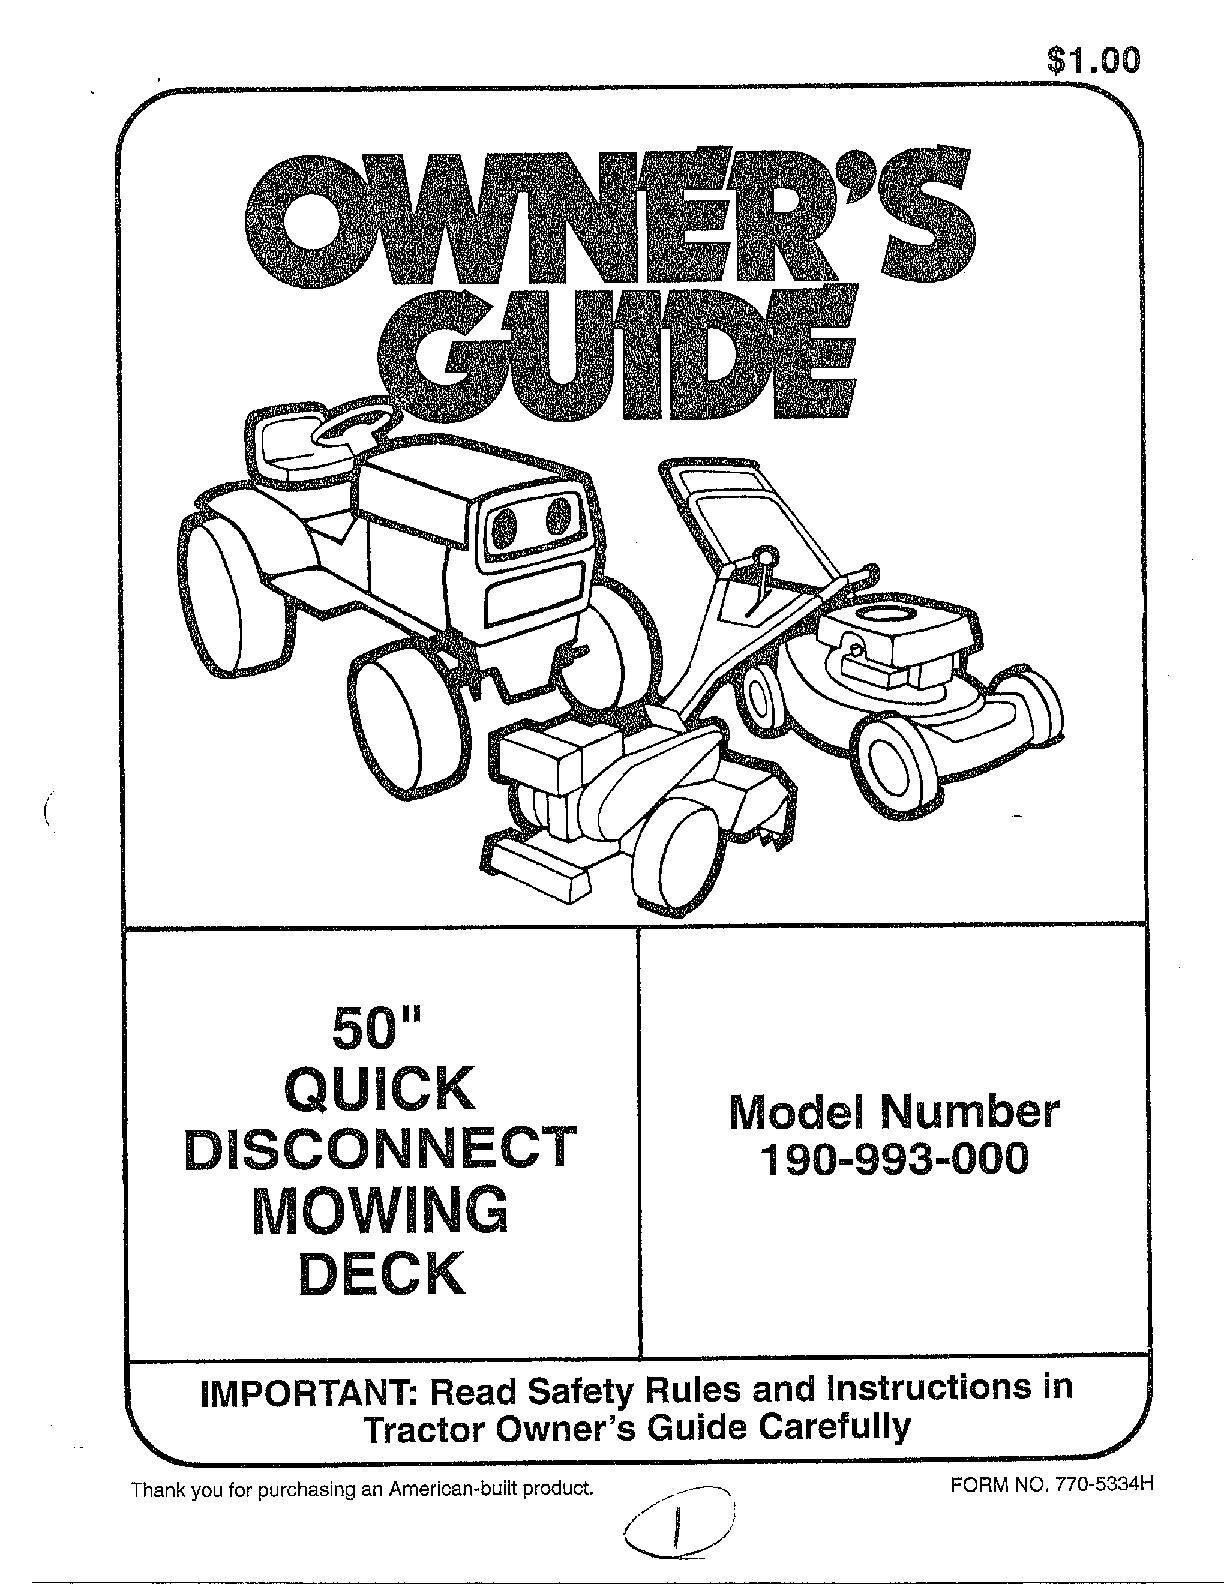 Mtd model 190-993-000 mower deck genuine parts